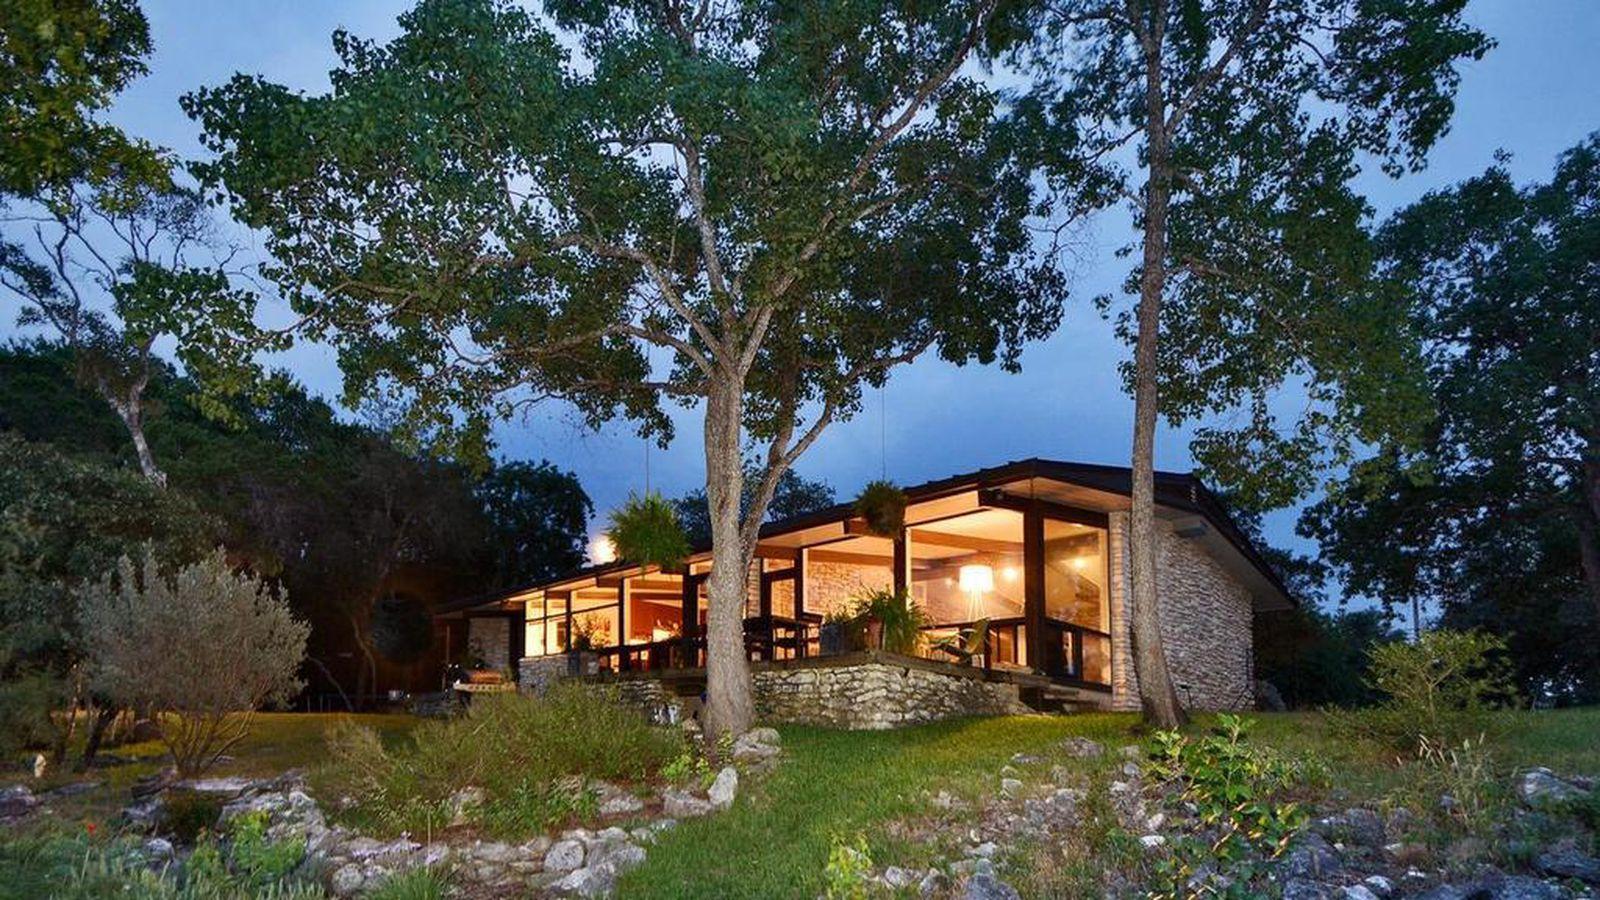 Gorgeous Midcentury Modern On West Lake Hilltop Asks 1